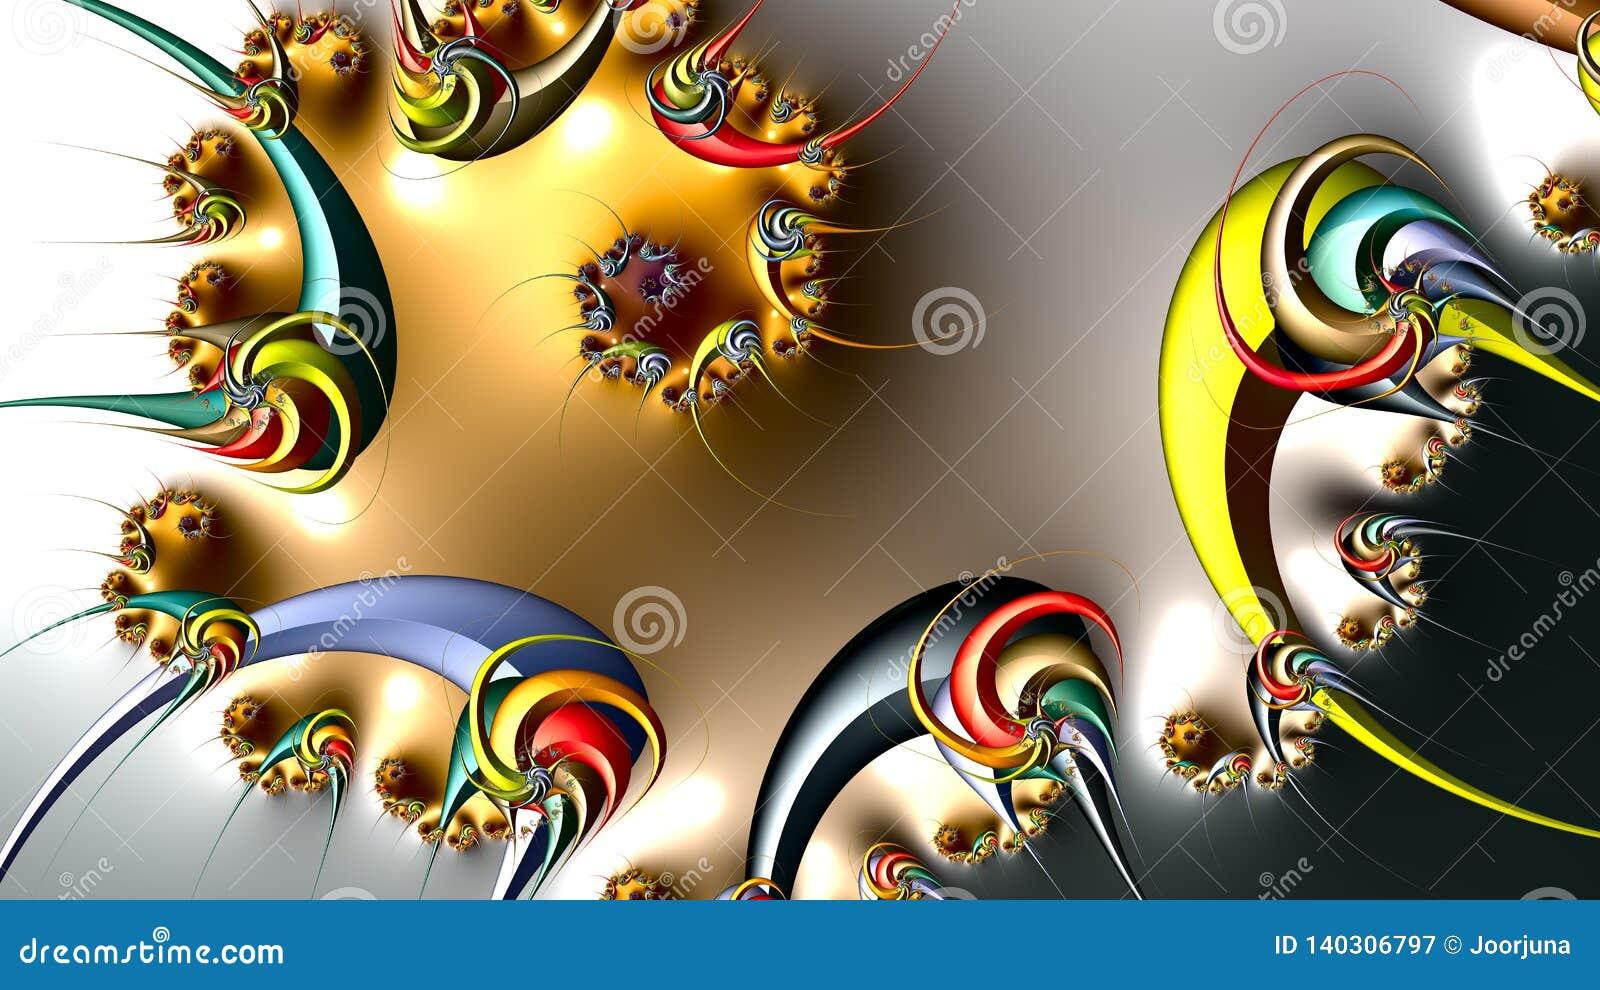 Ilustraciones del fractal